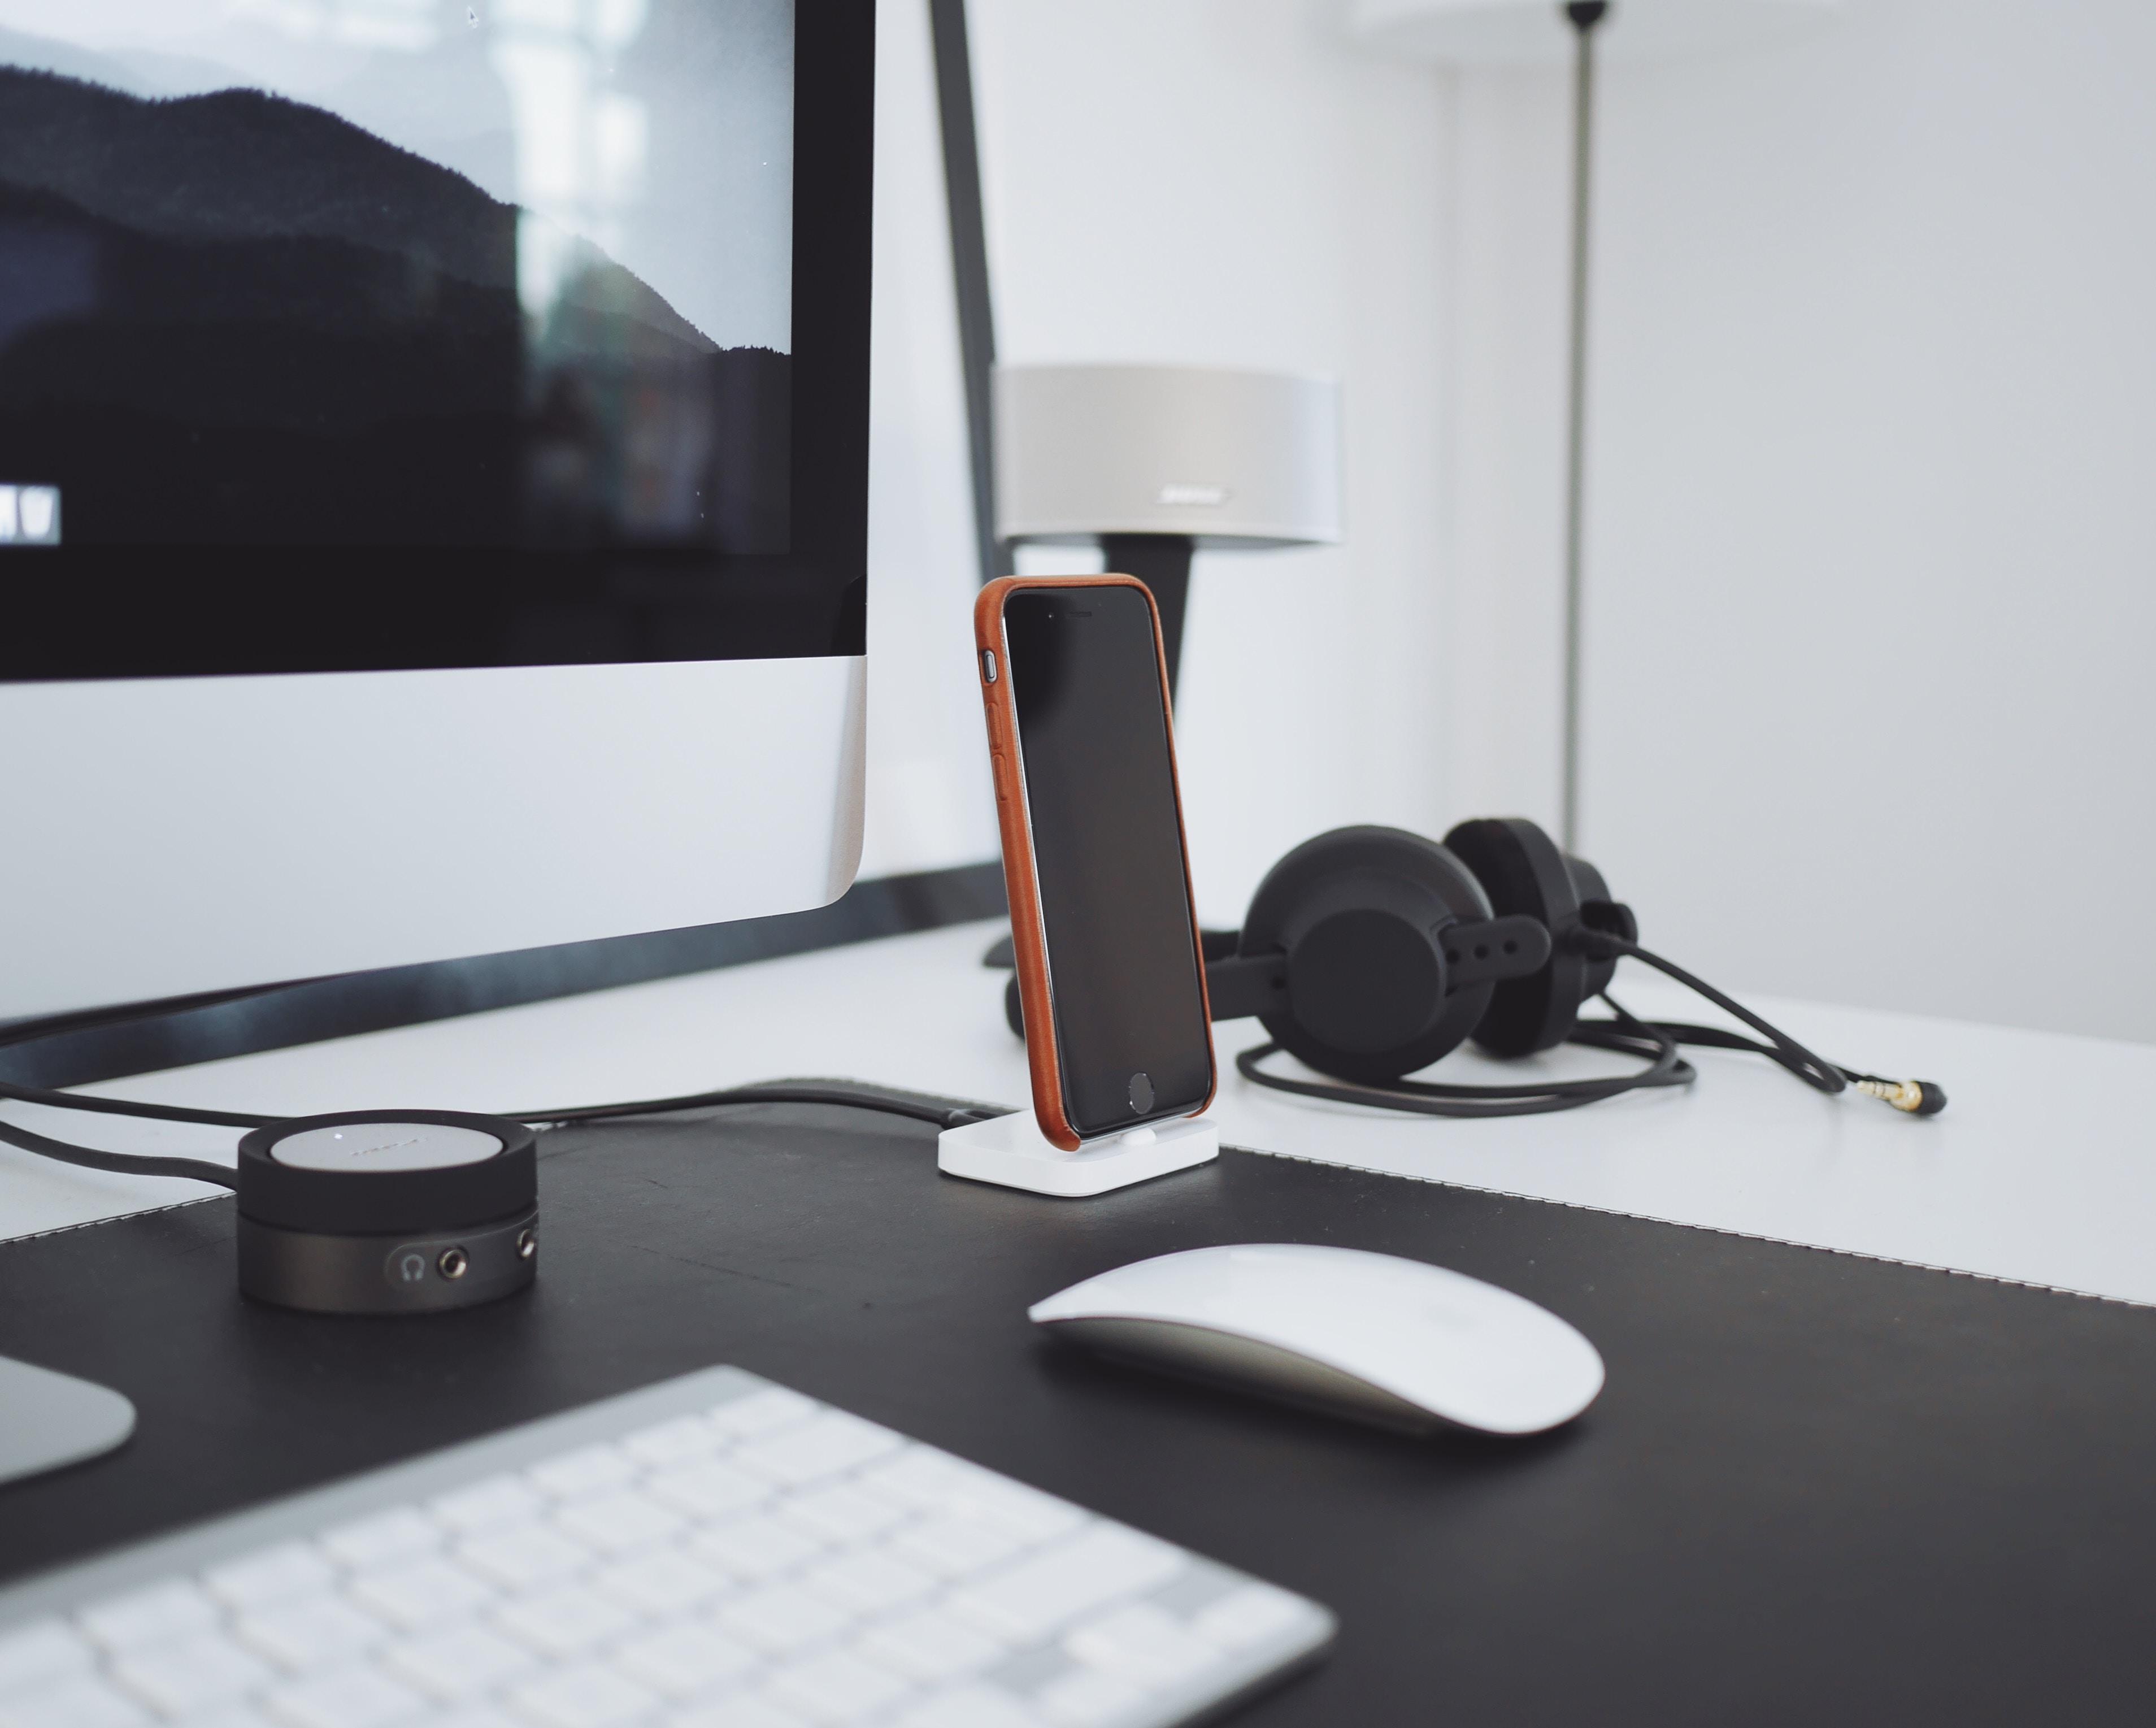 black iPhone charged on table near black headphones